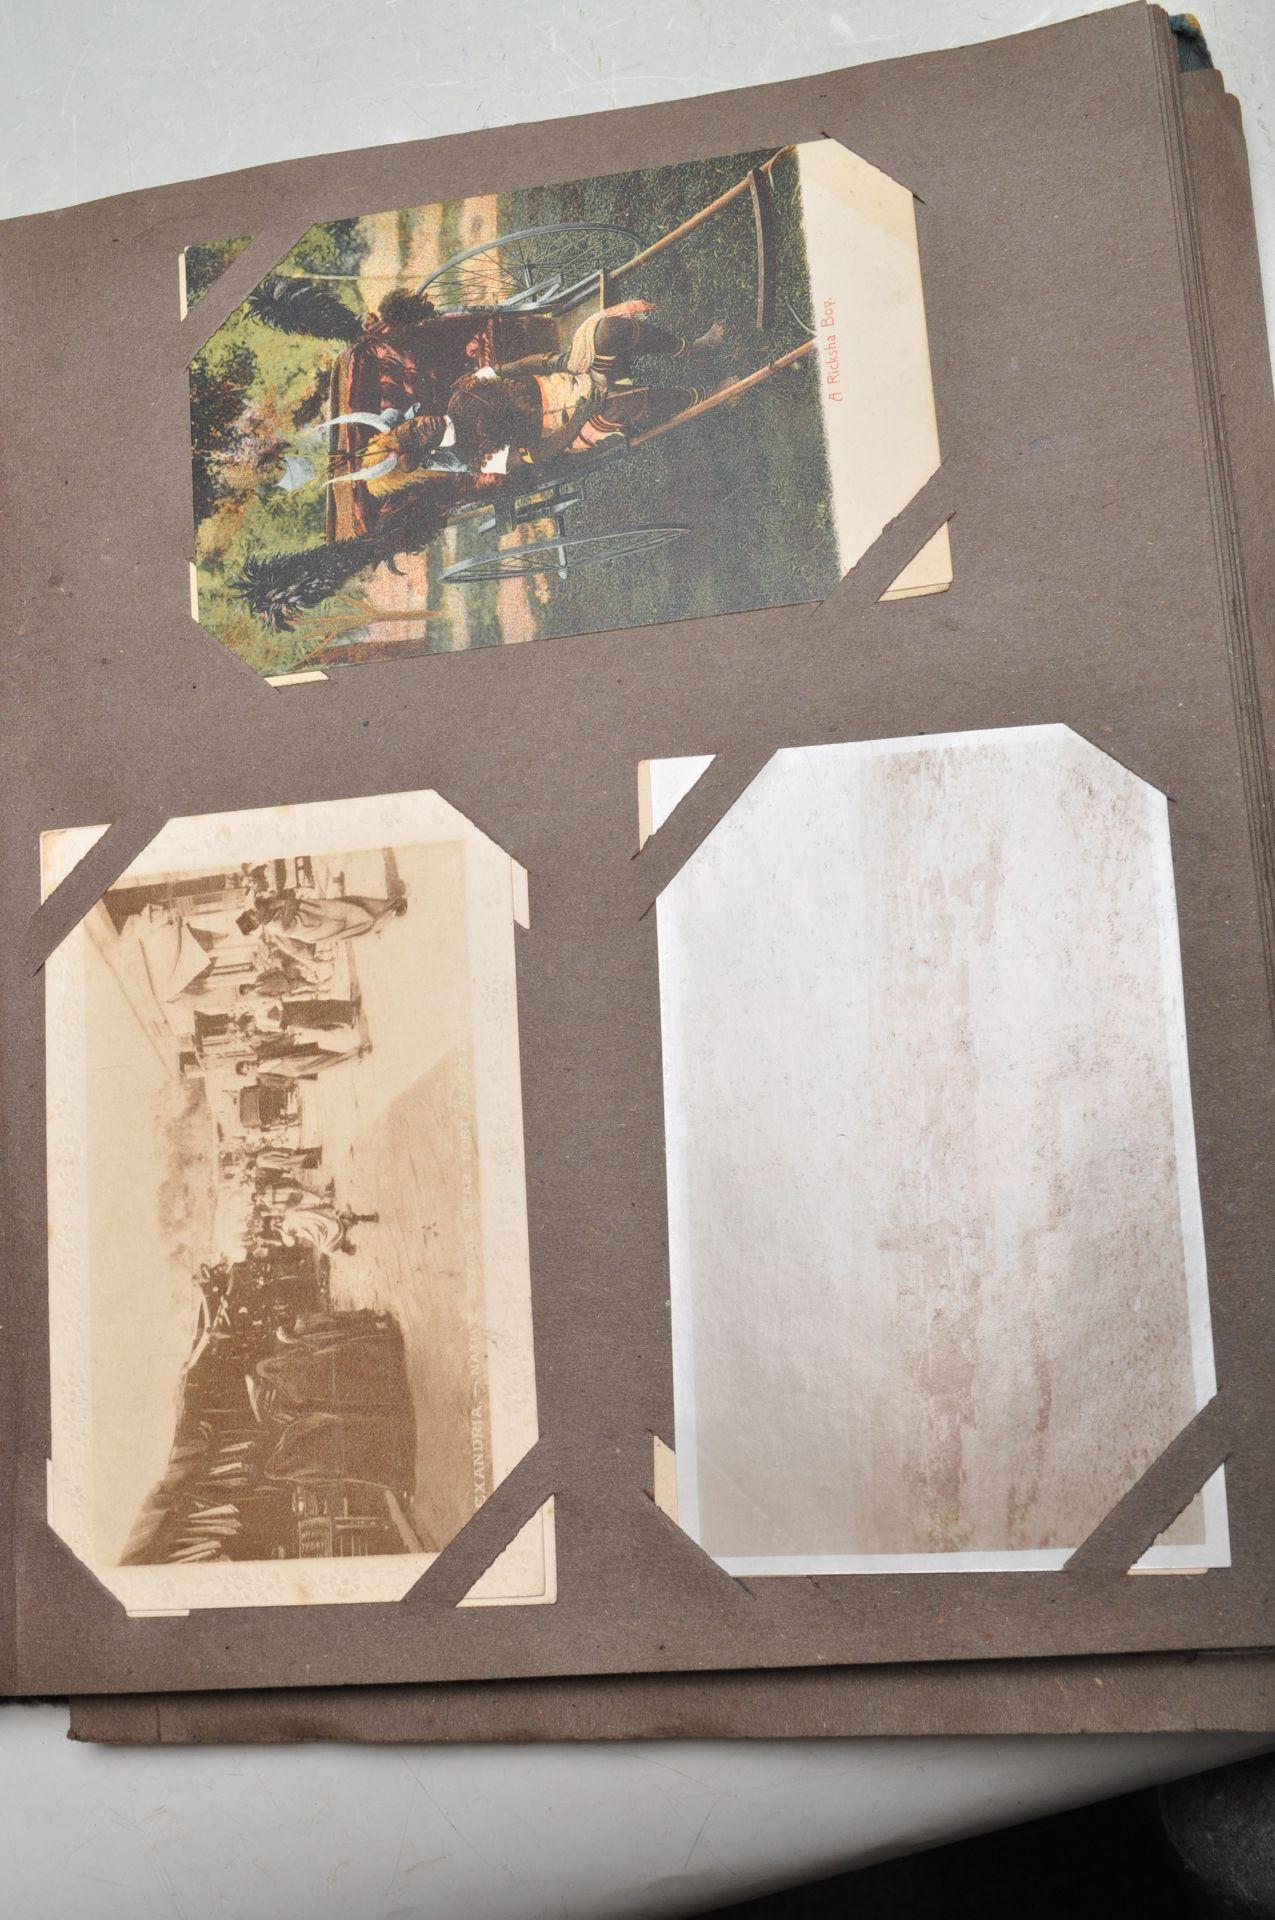 ALBUM OF FOREIGN POSTCARDS - ALL CIRCA WW1 PERIOD - Bild 21 aus 23